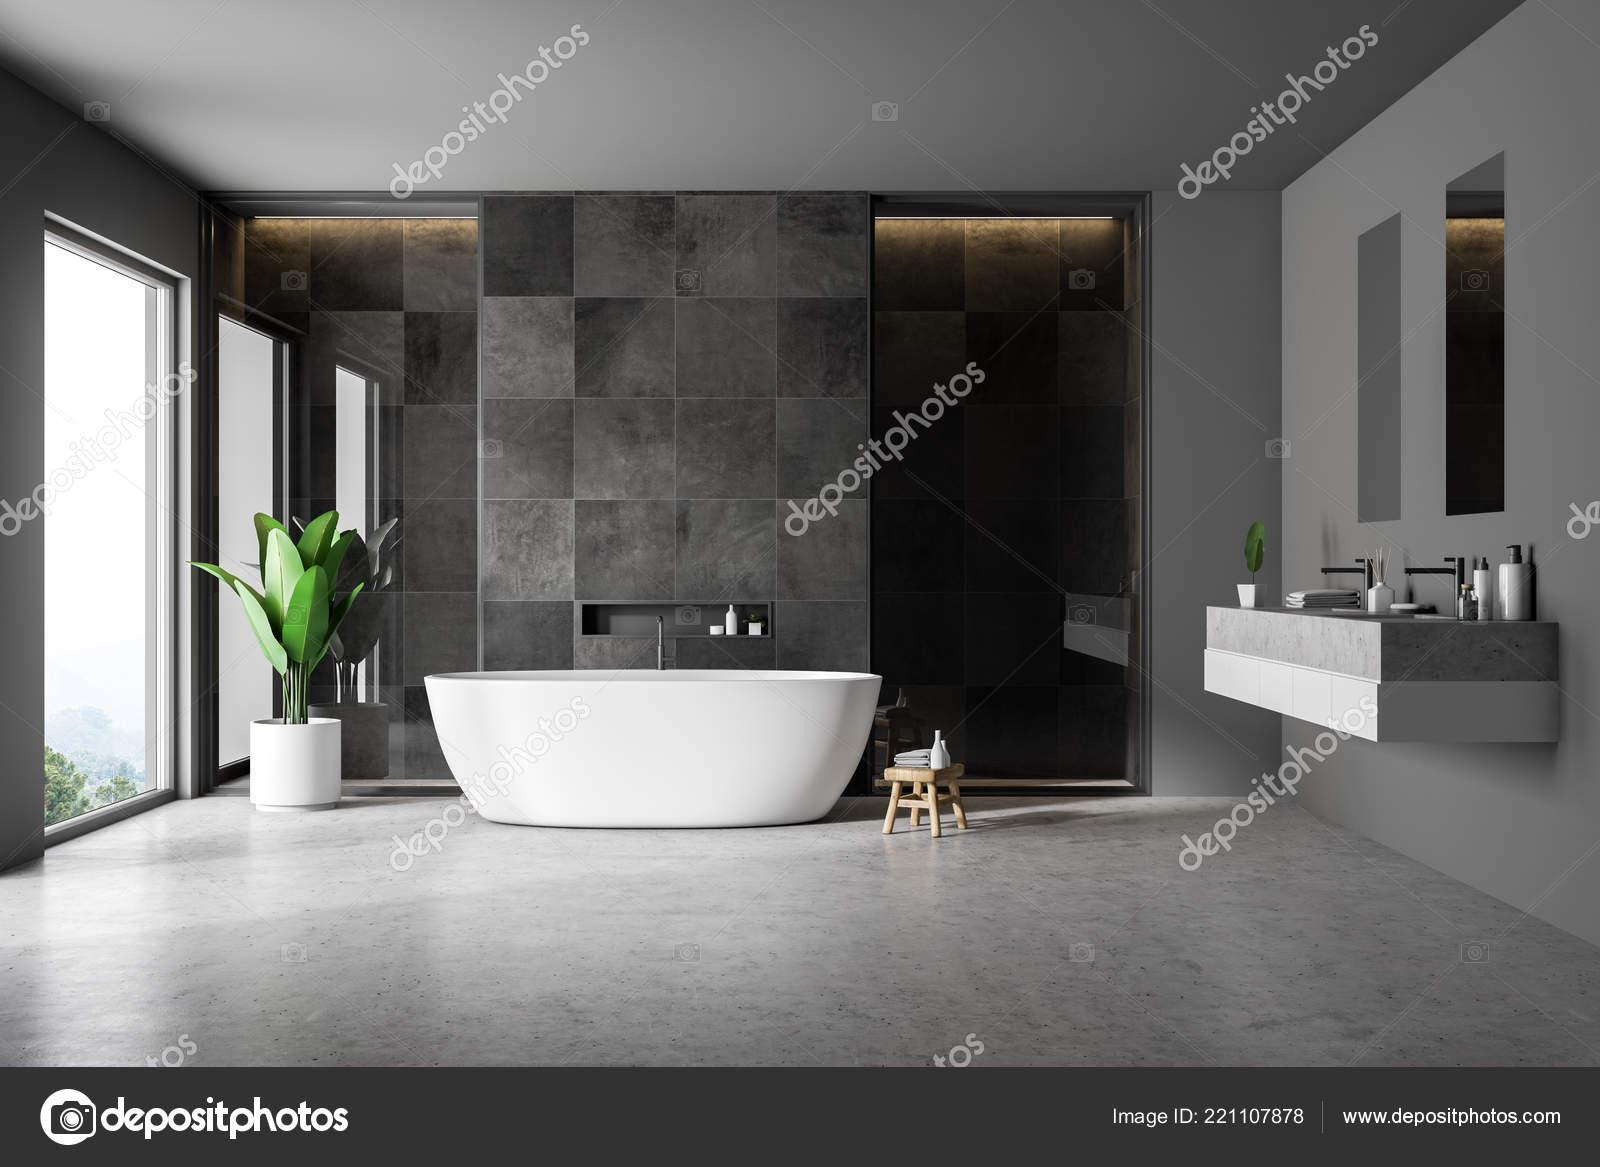 Interior Cuarto Baño Moderno Con Paredes Azulejo Negro Piso Concreto ...